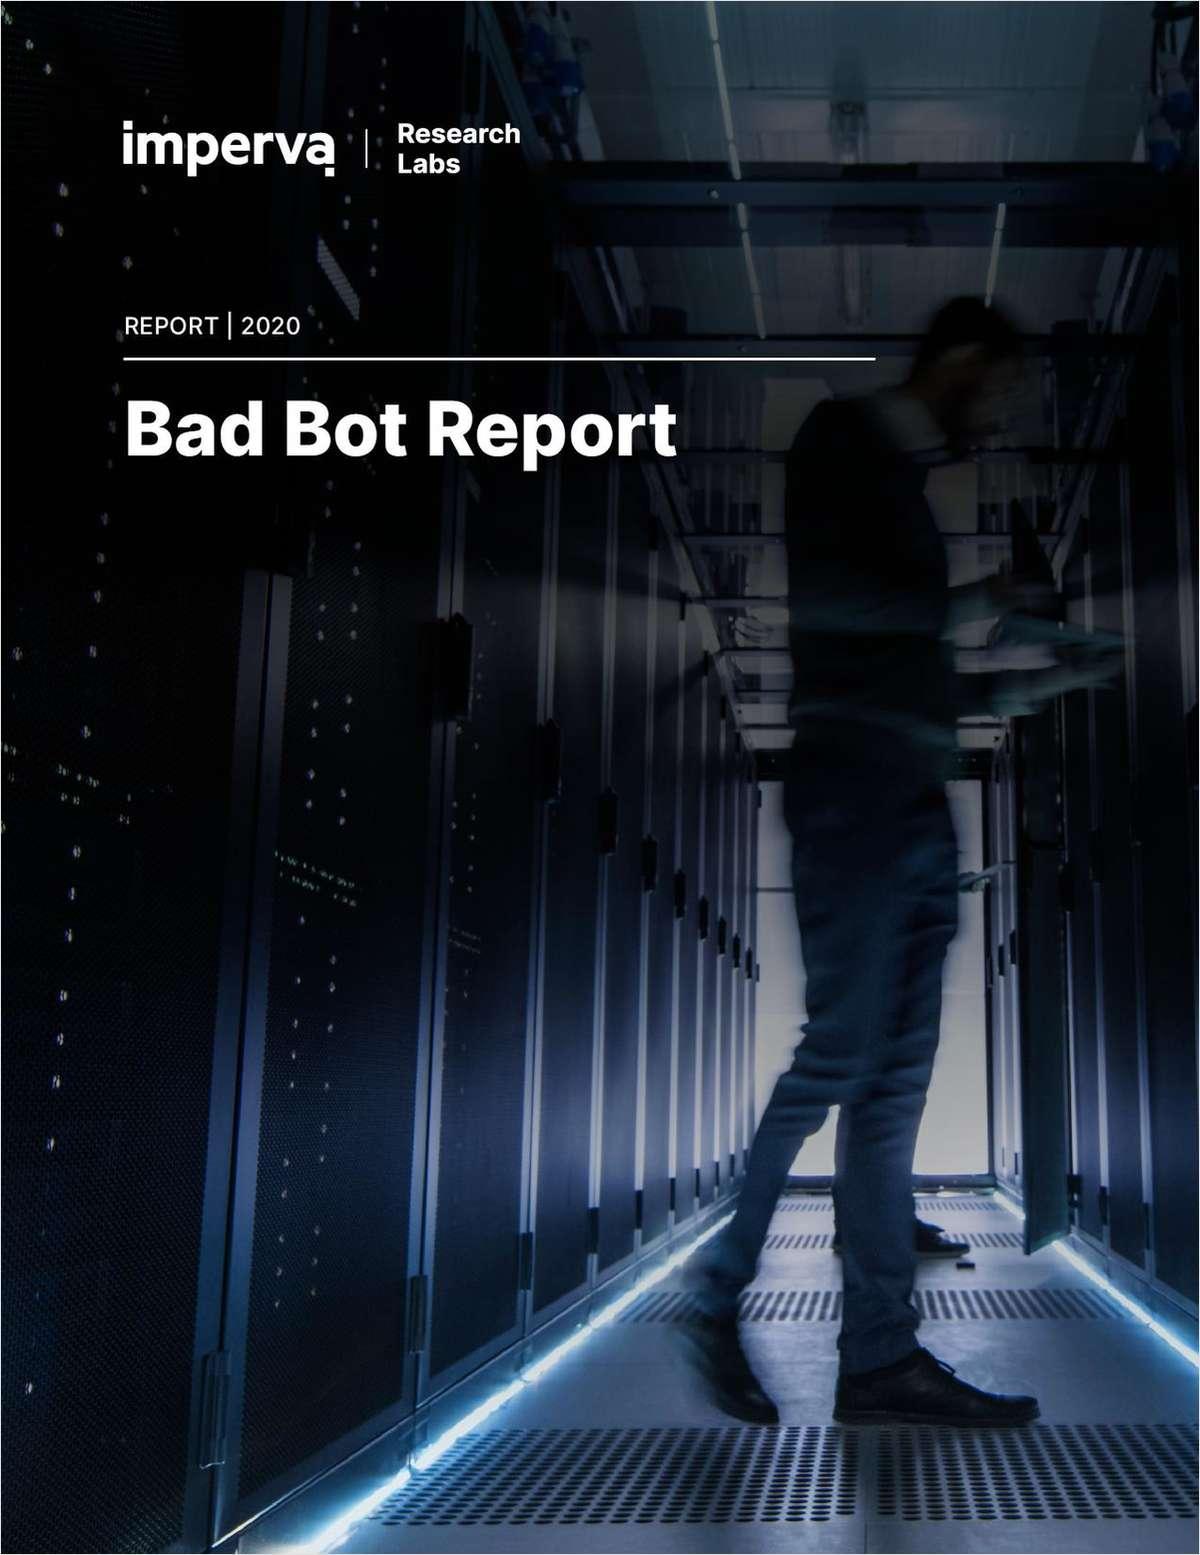 Bad Bot Report